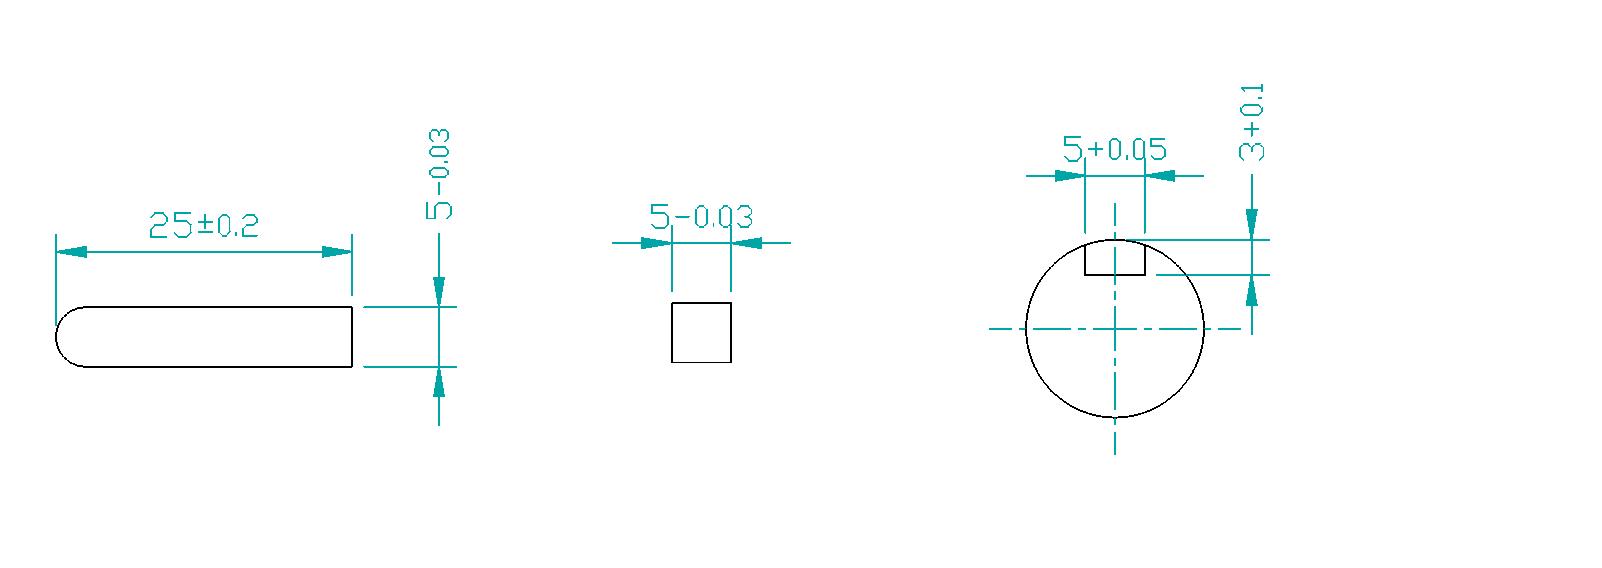 180 Watt Induction Motor And Gear Swipfe Engineering Pvt Ltd Wiring Diagram 6 Lead 3 Phase 480 Volt Weight Kg